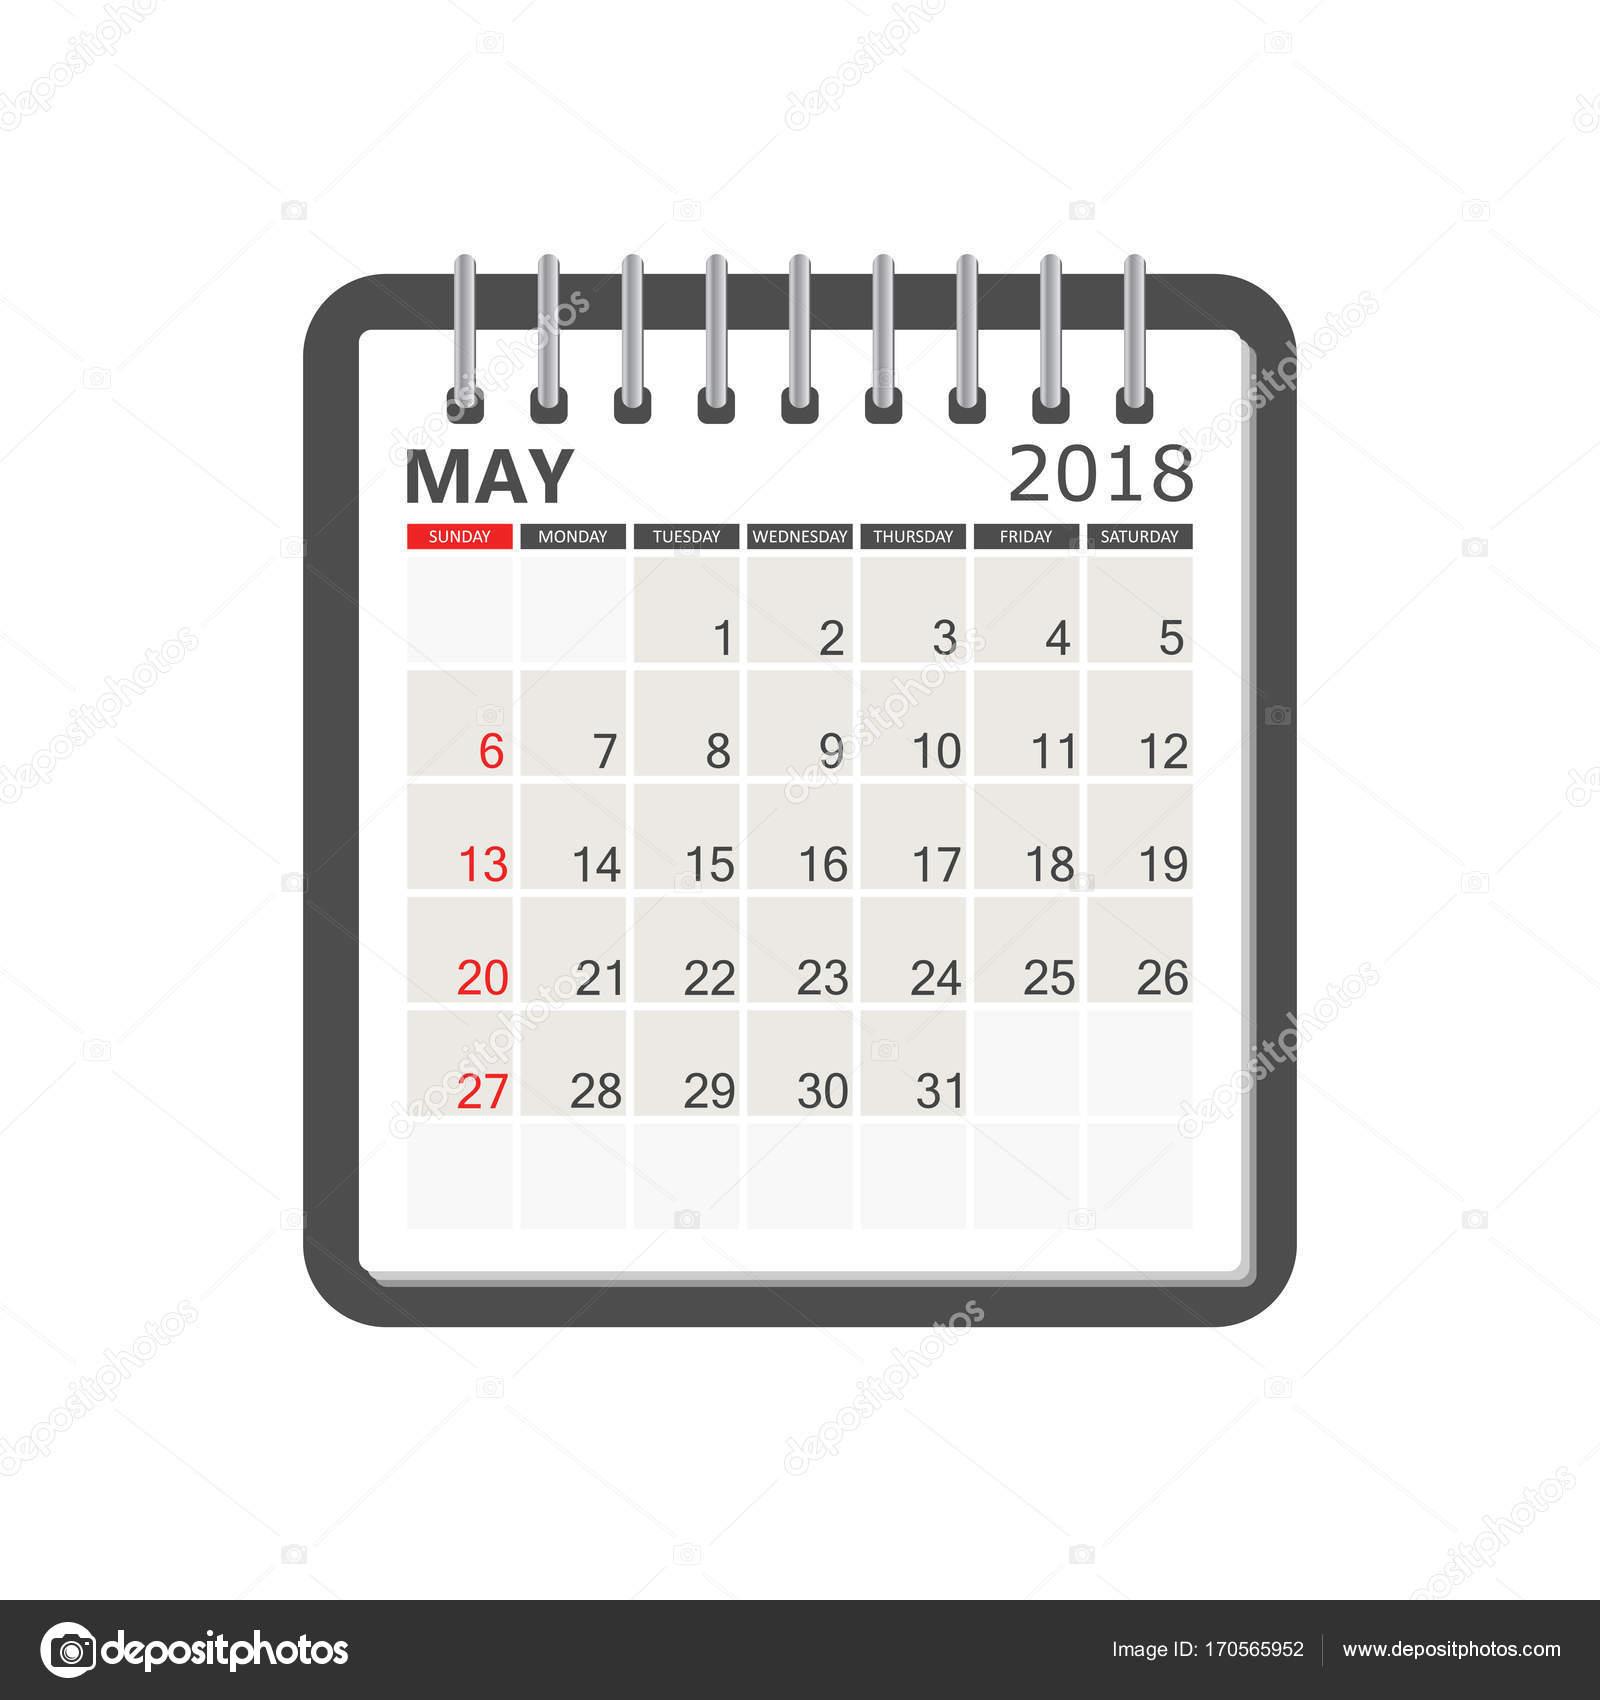 may 2018 calendar page